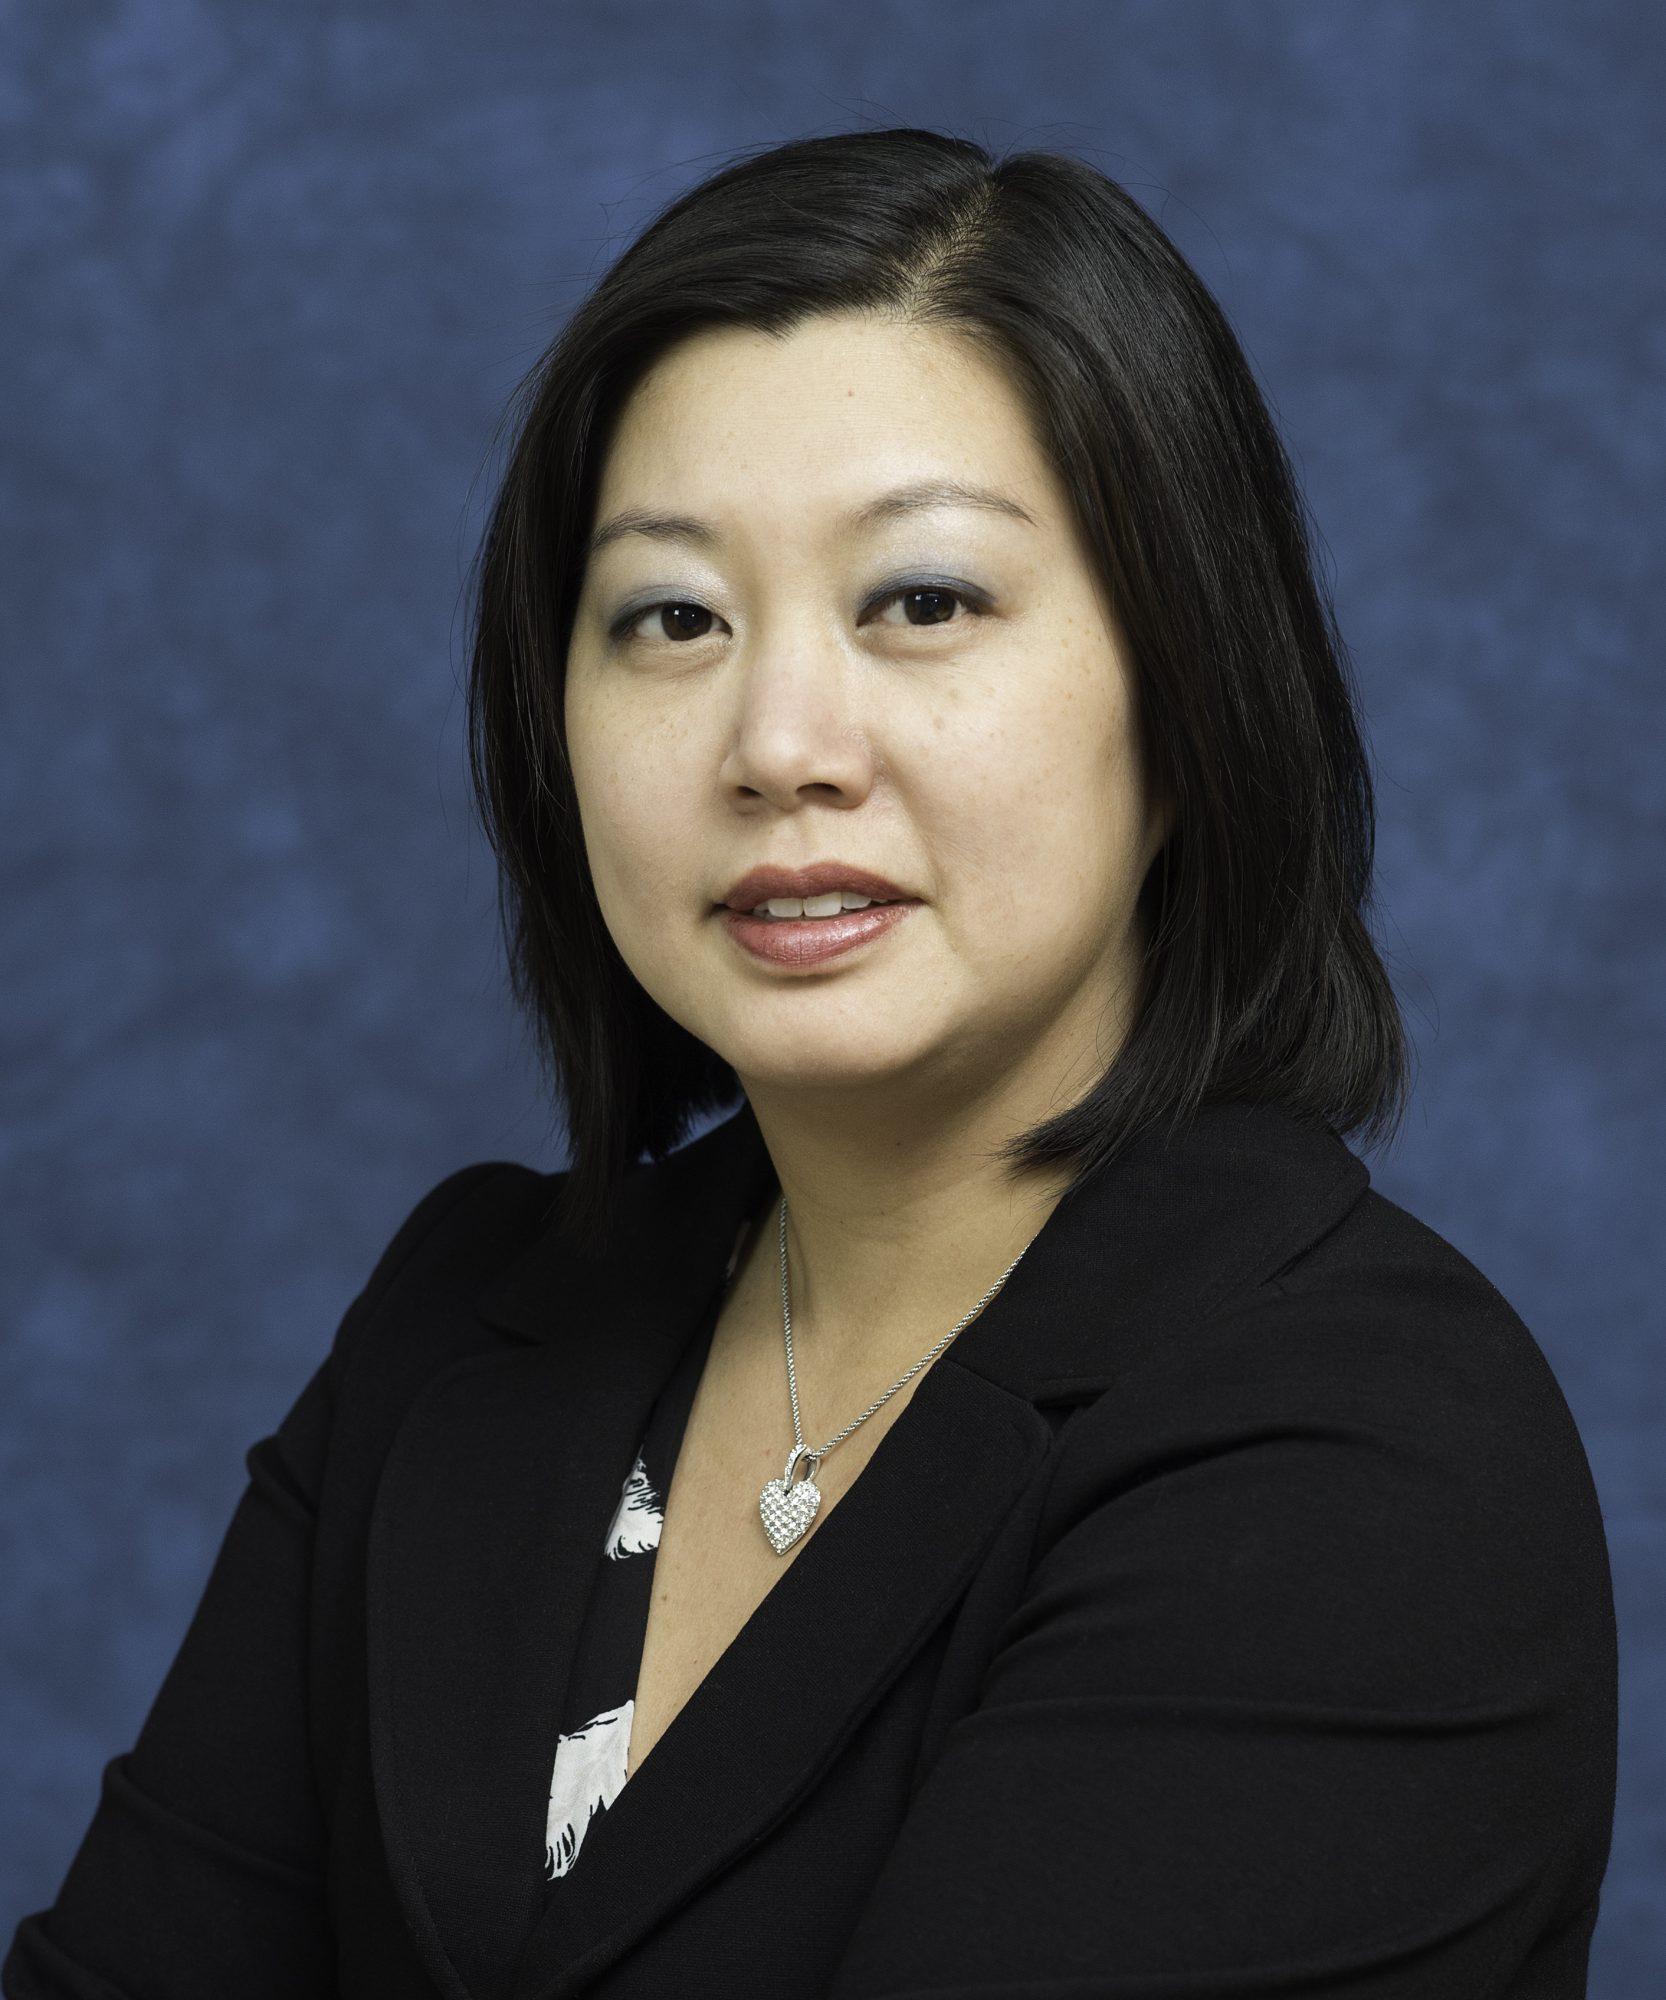 Jeanne Liu